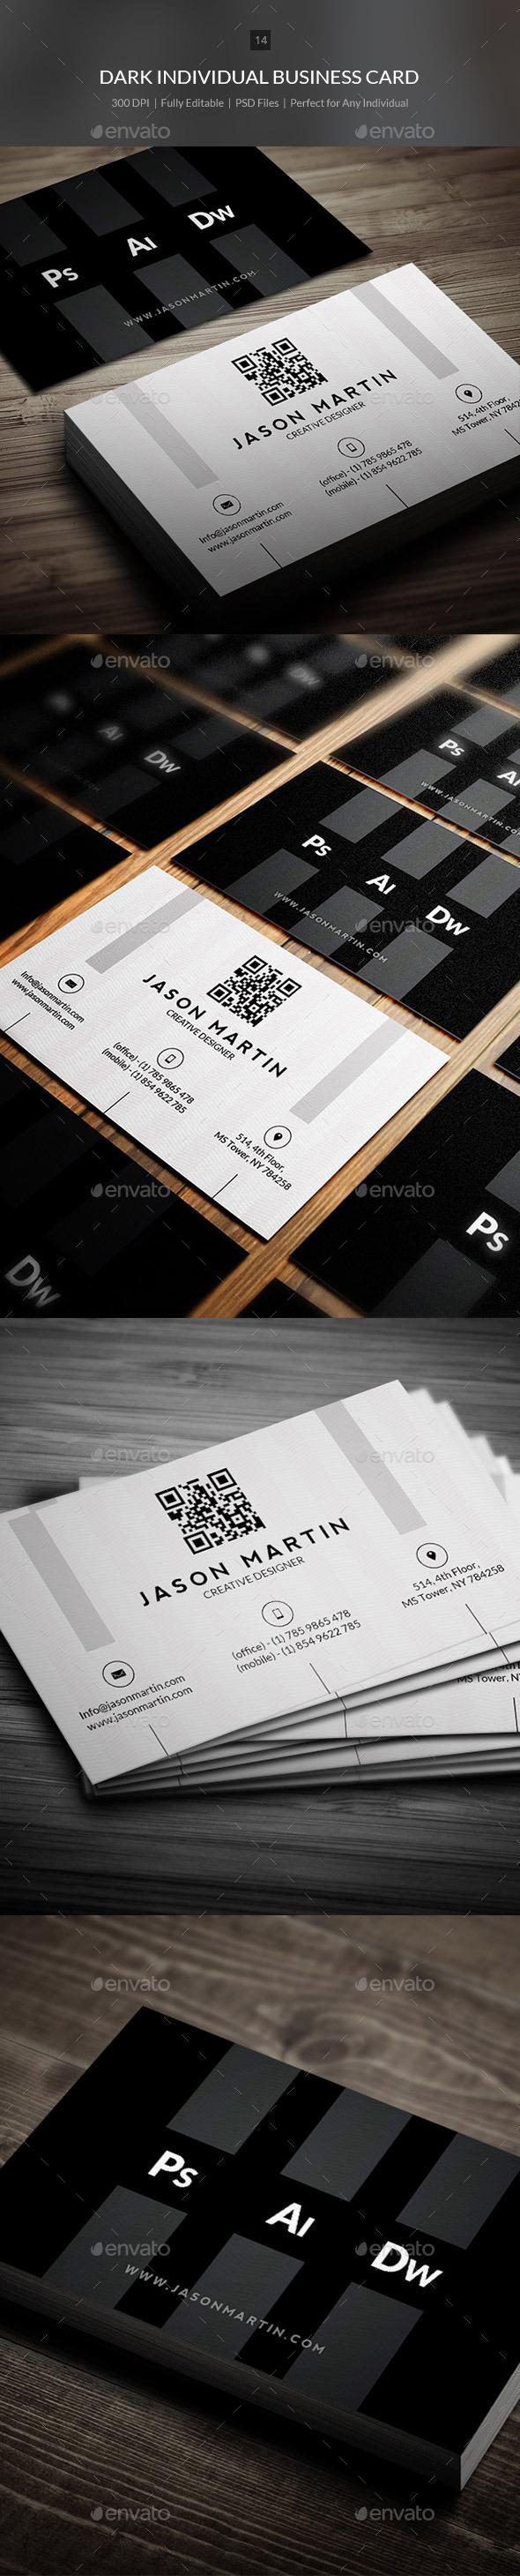 Dark Corporate Business Card - 14 - Creative Business Cards